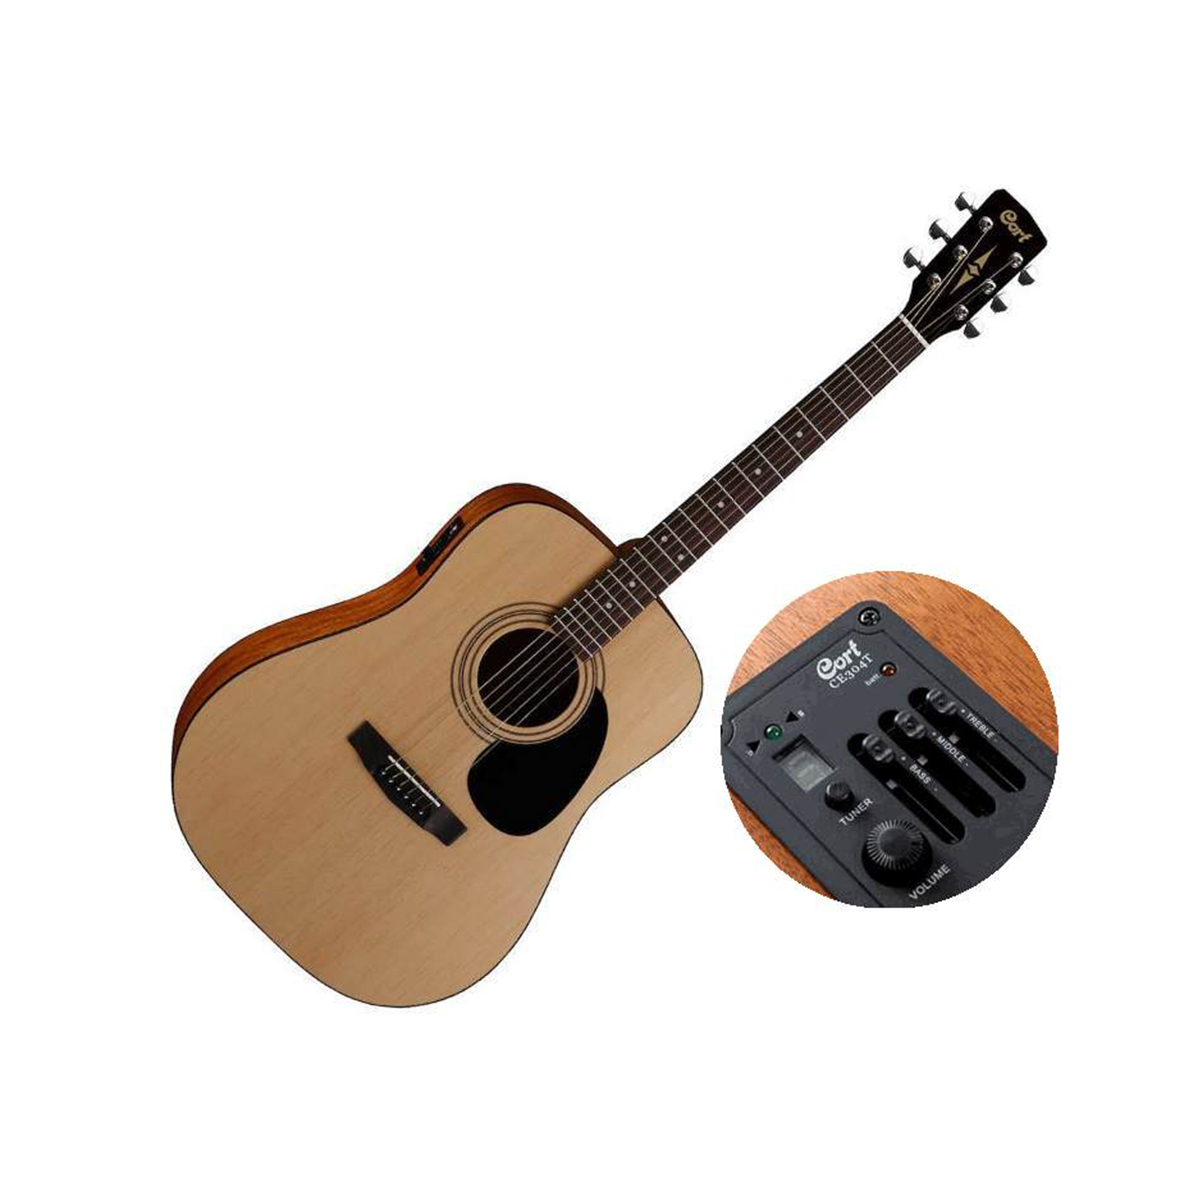 Cort AD810E OP Electro Acoustic Guitar